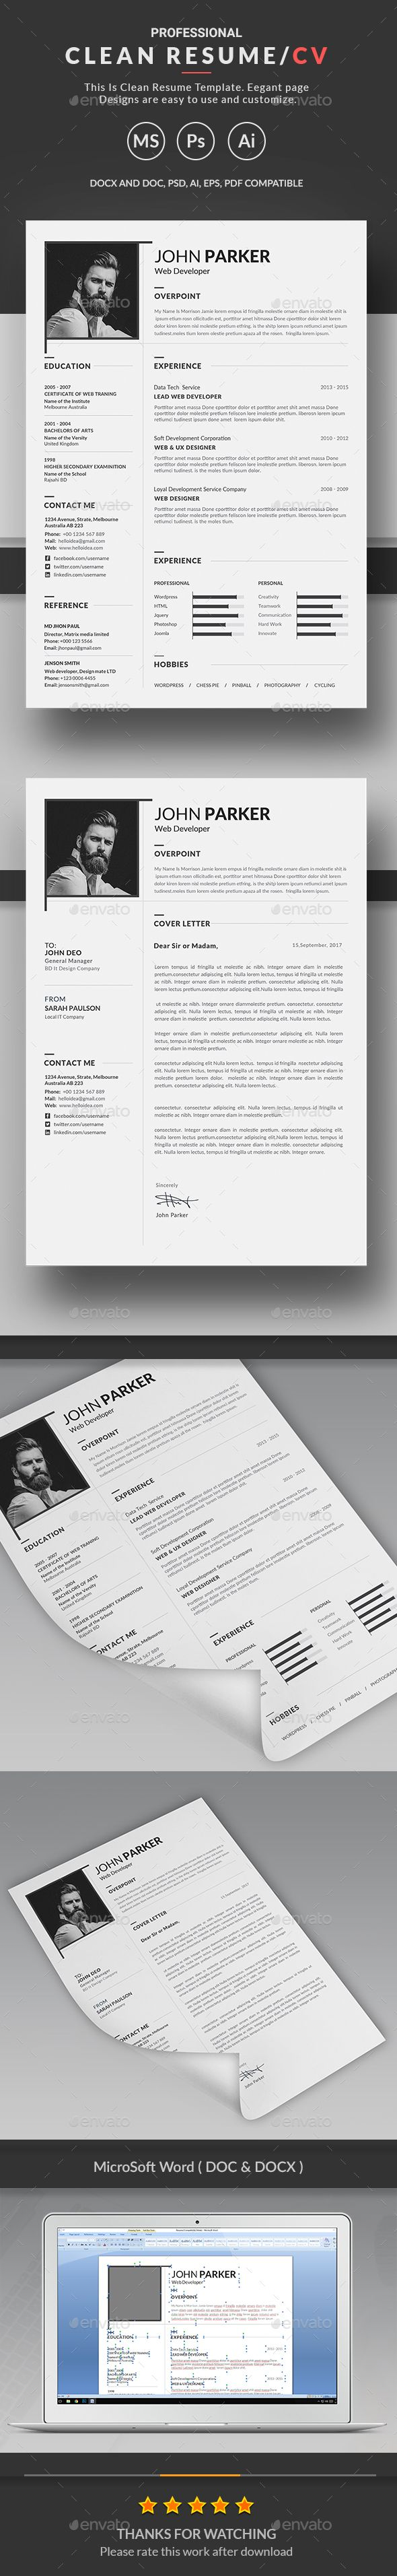 Resume | Cv | Pinterest | Currículum, Habilidades y Profesional